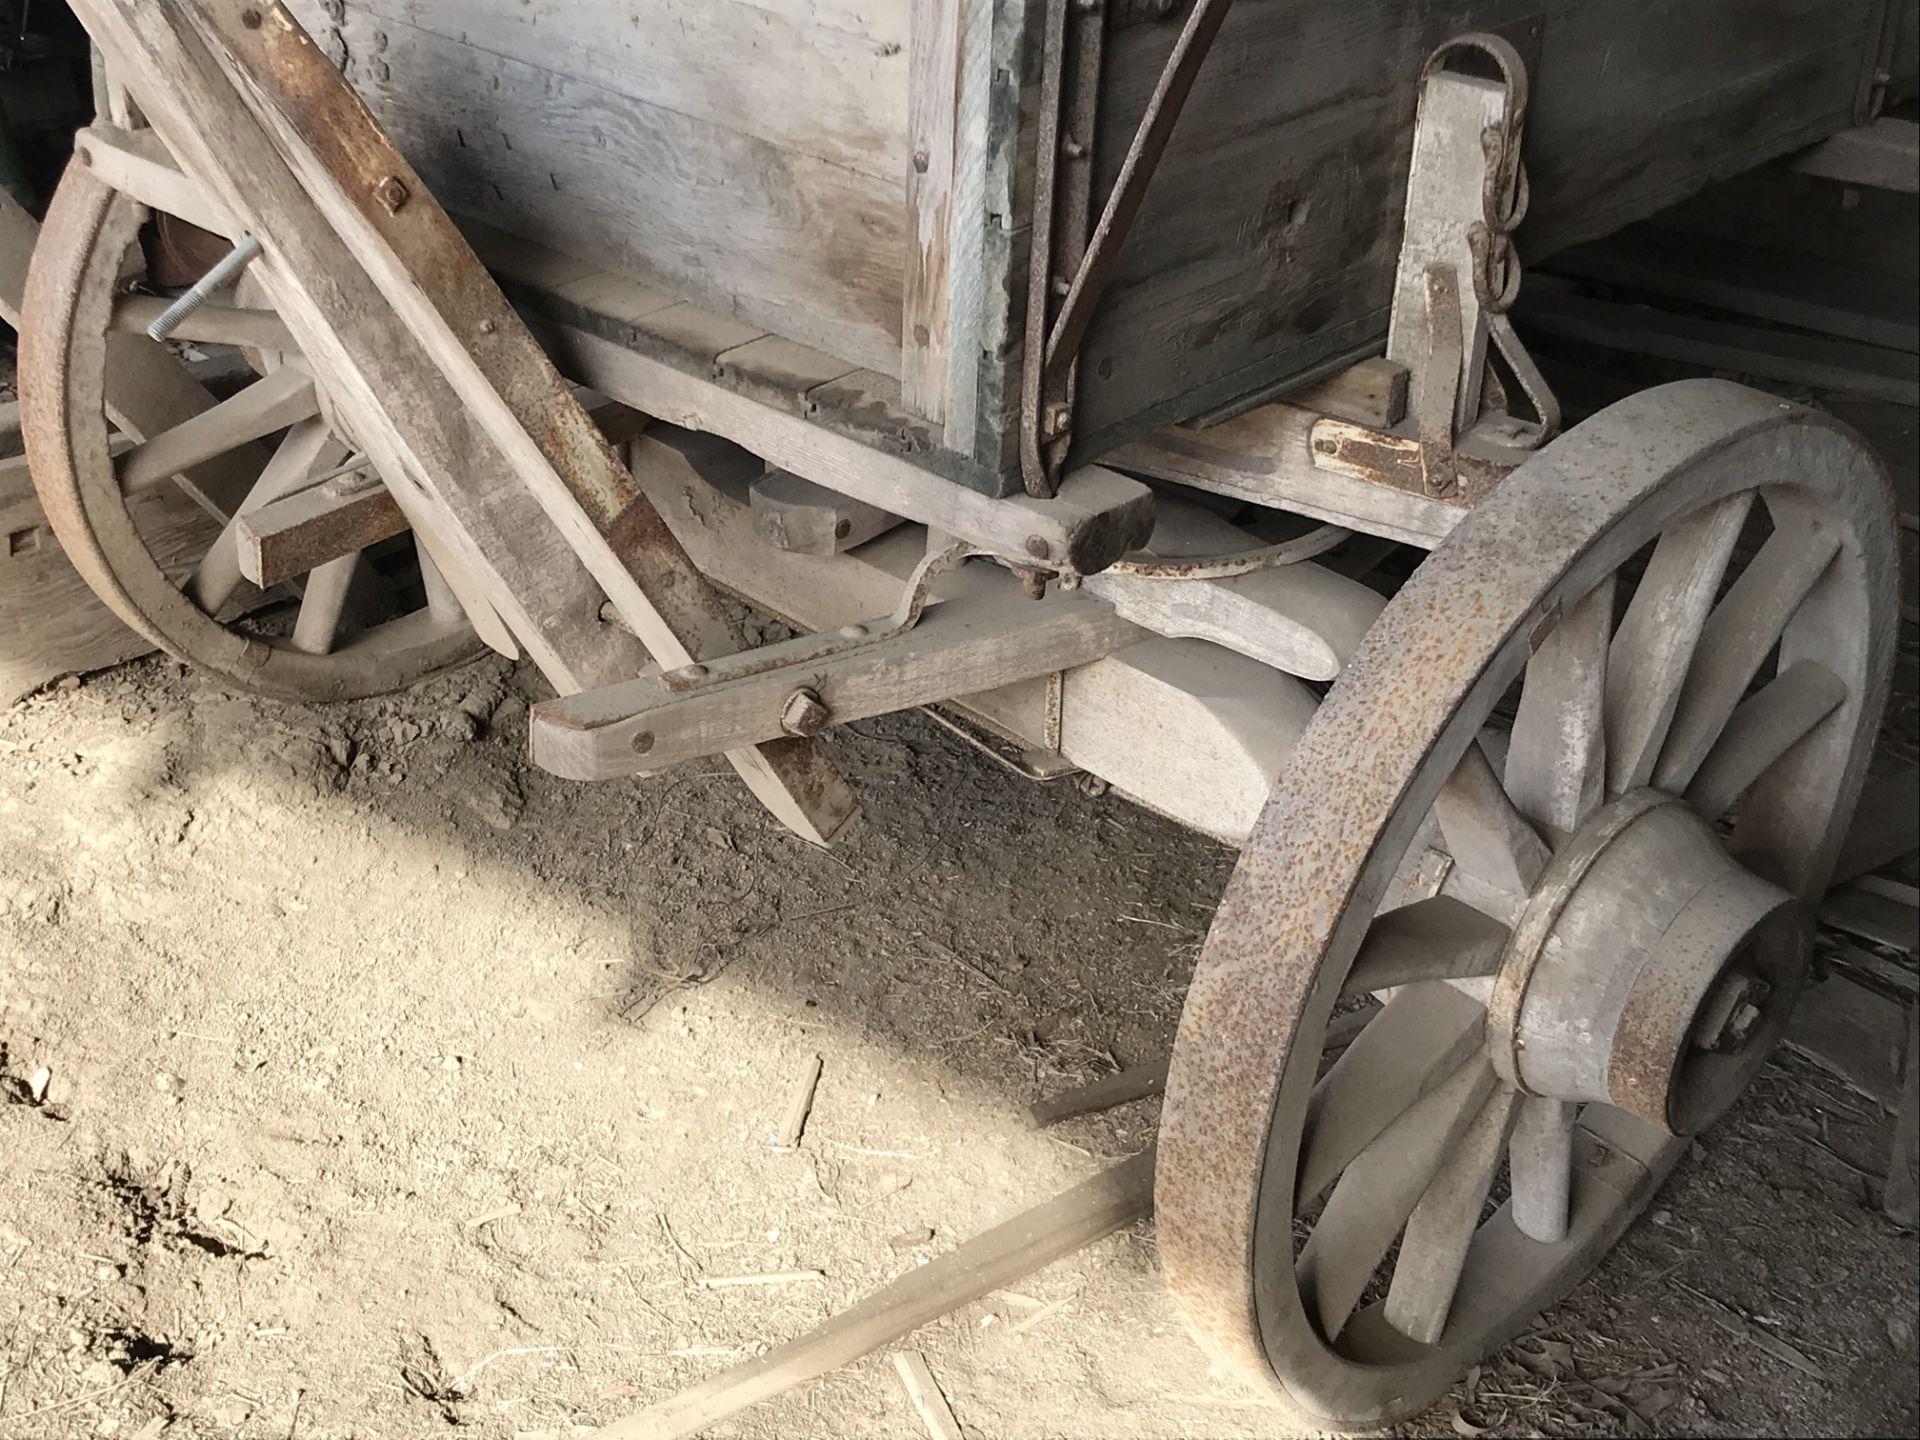 Lot 54a - 4 Wheel Wood Wagon w/Side Boards, Good Wheels, (shedded)